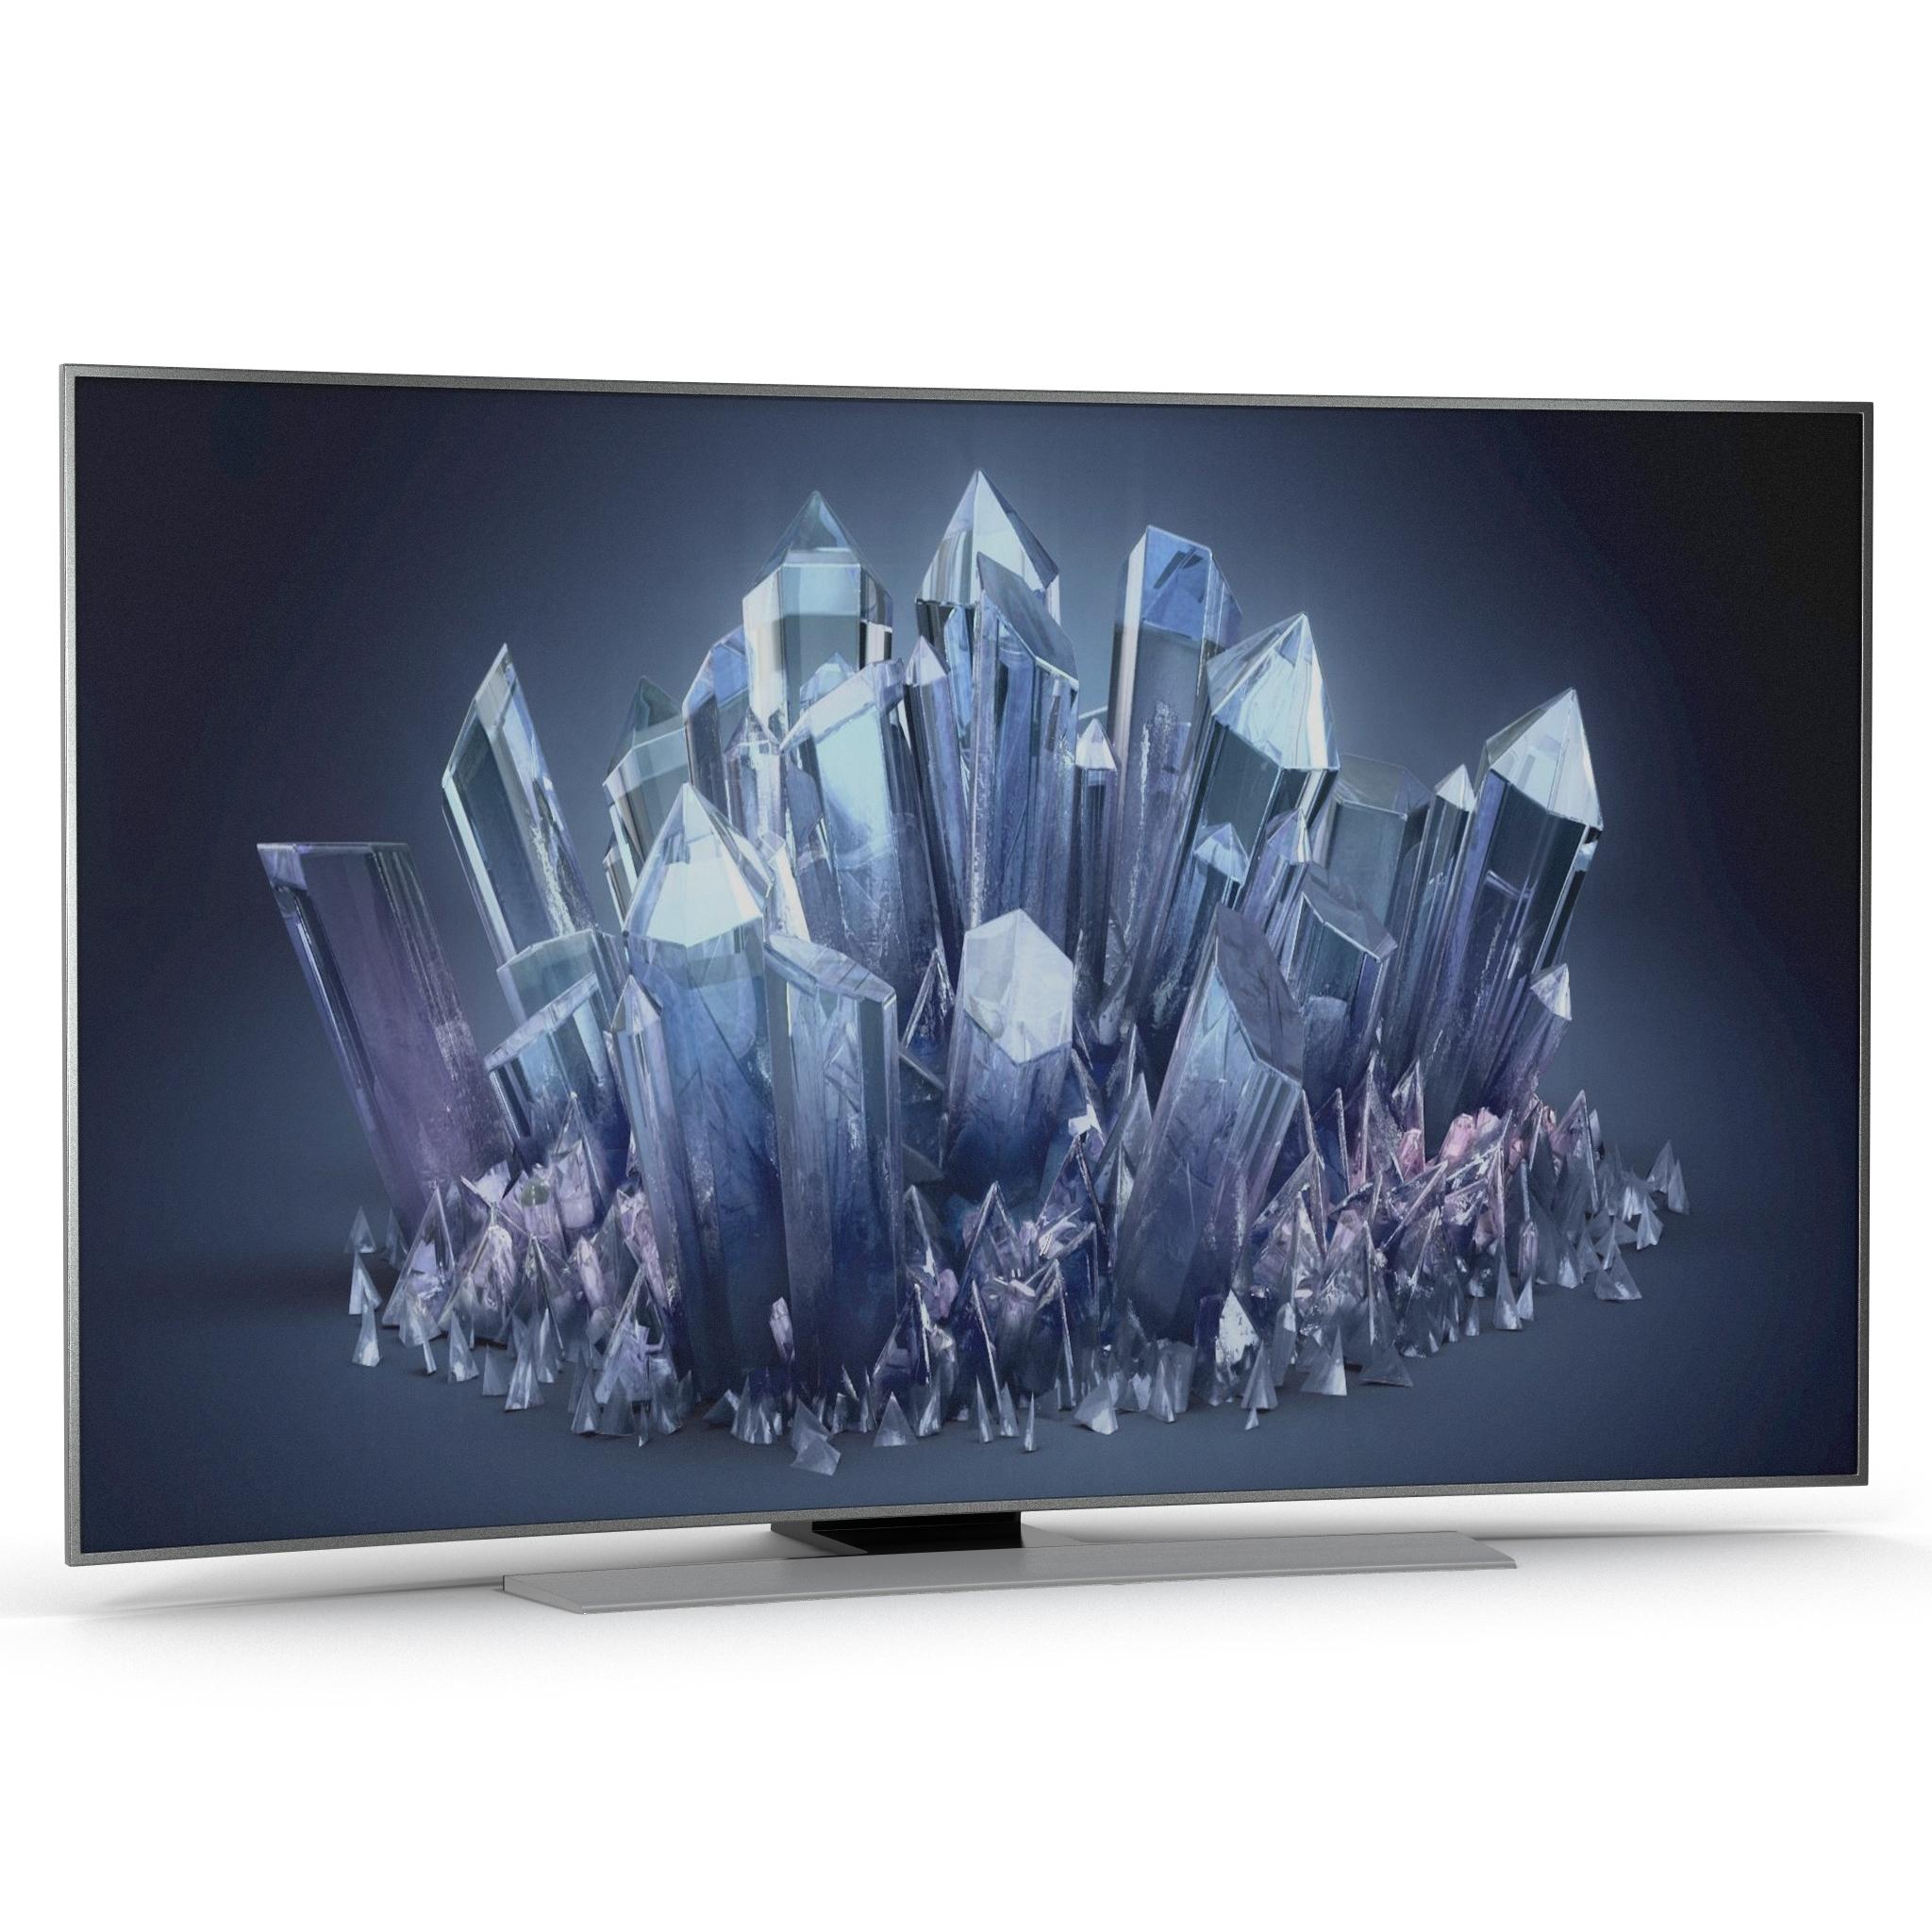 Samsung 4k Uhd Hu9000 Series Smart Tv 65 Zoll Gebogen 3d Modell